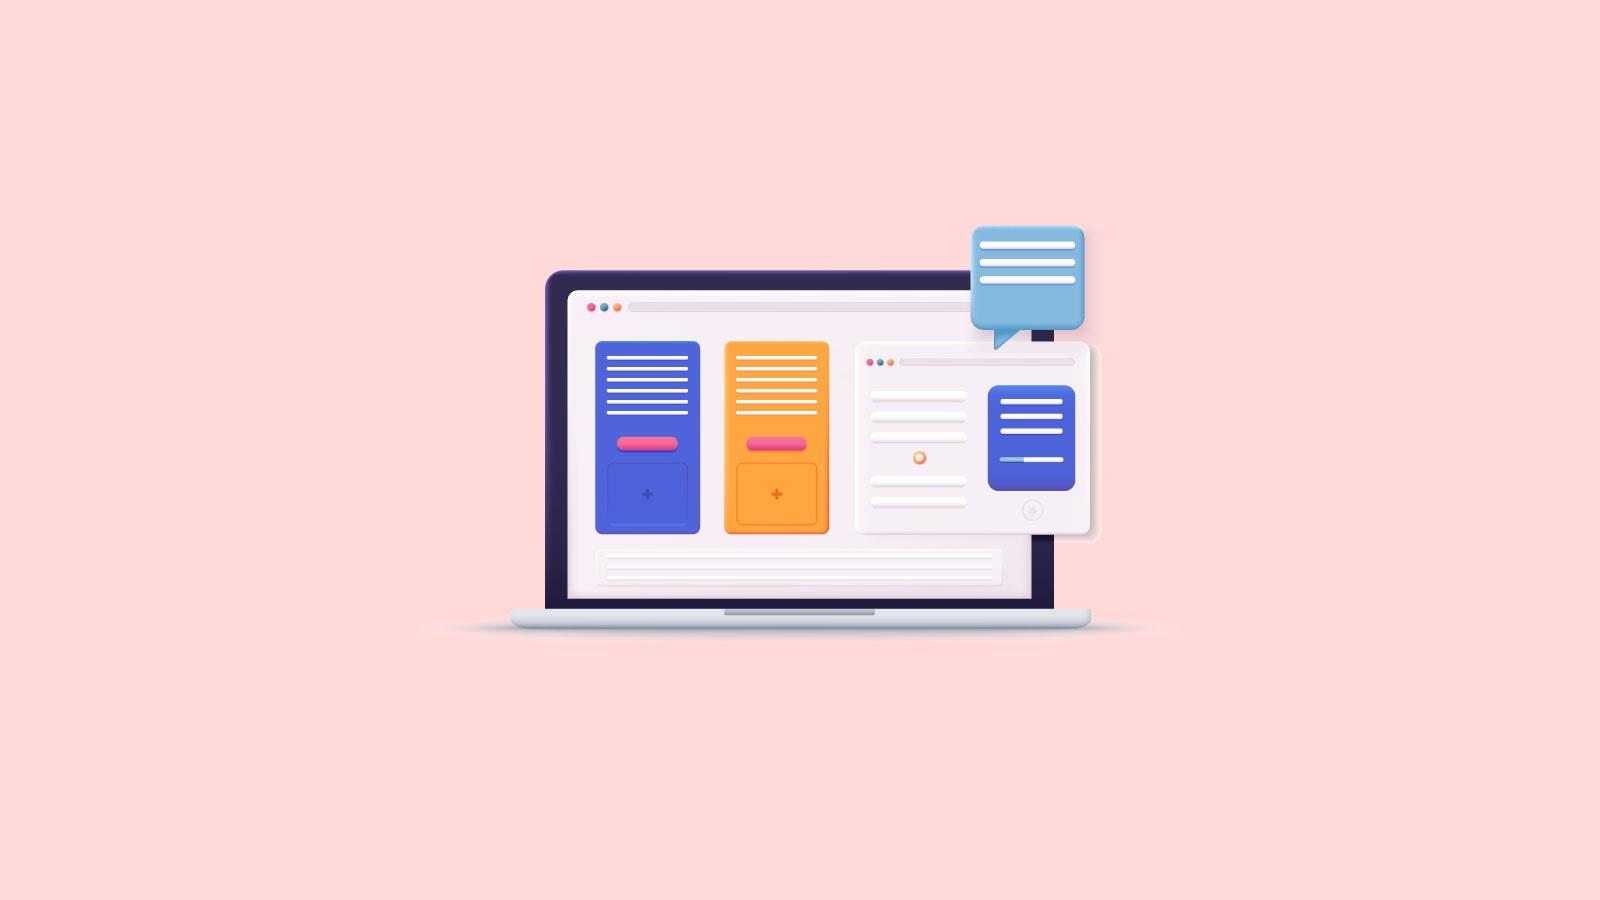 Beginner's Guide to Wireframing for Website Design